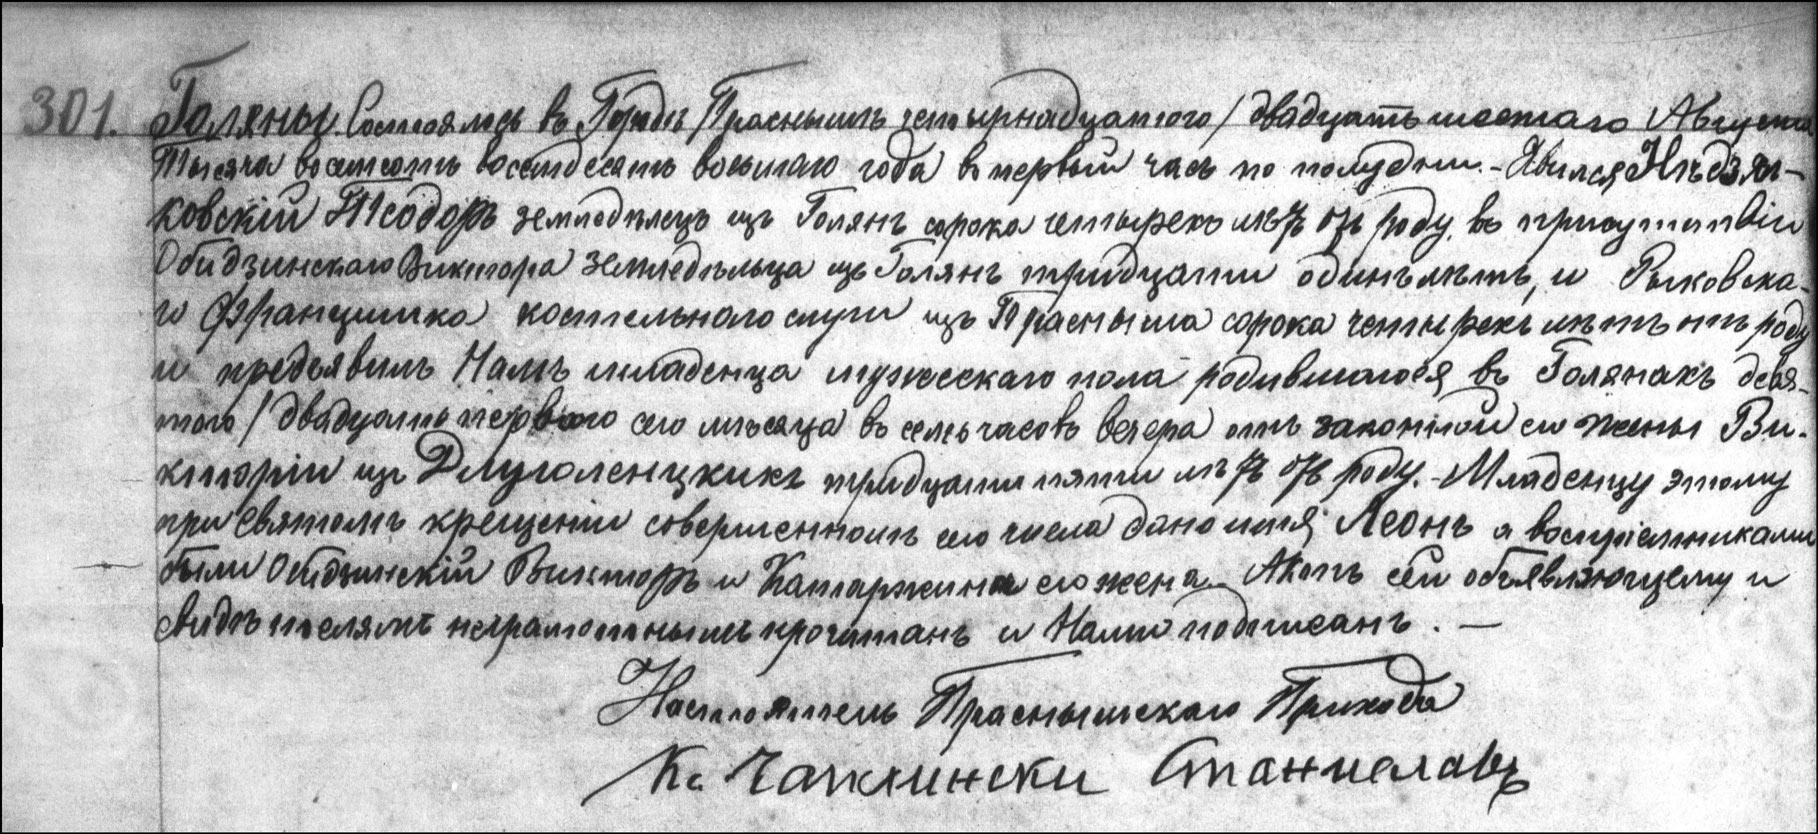 The Birth and Baptismal Record of Leon Niedzialkowski - 1888